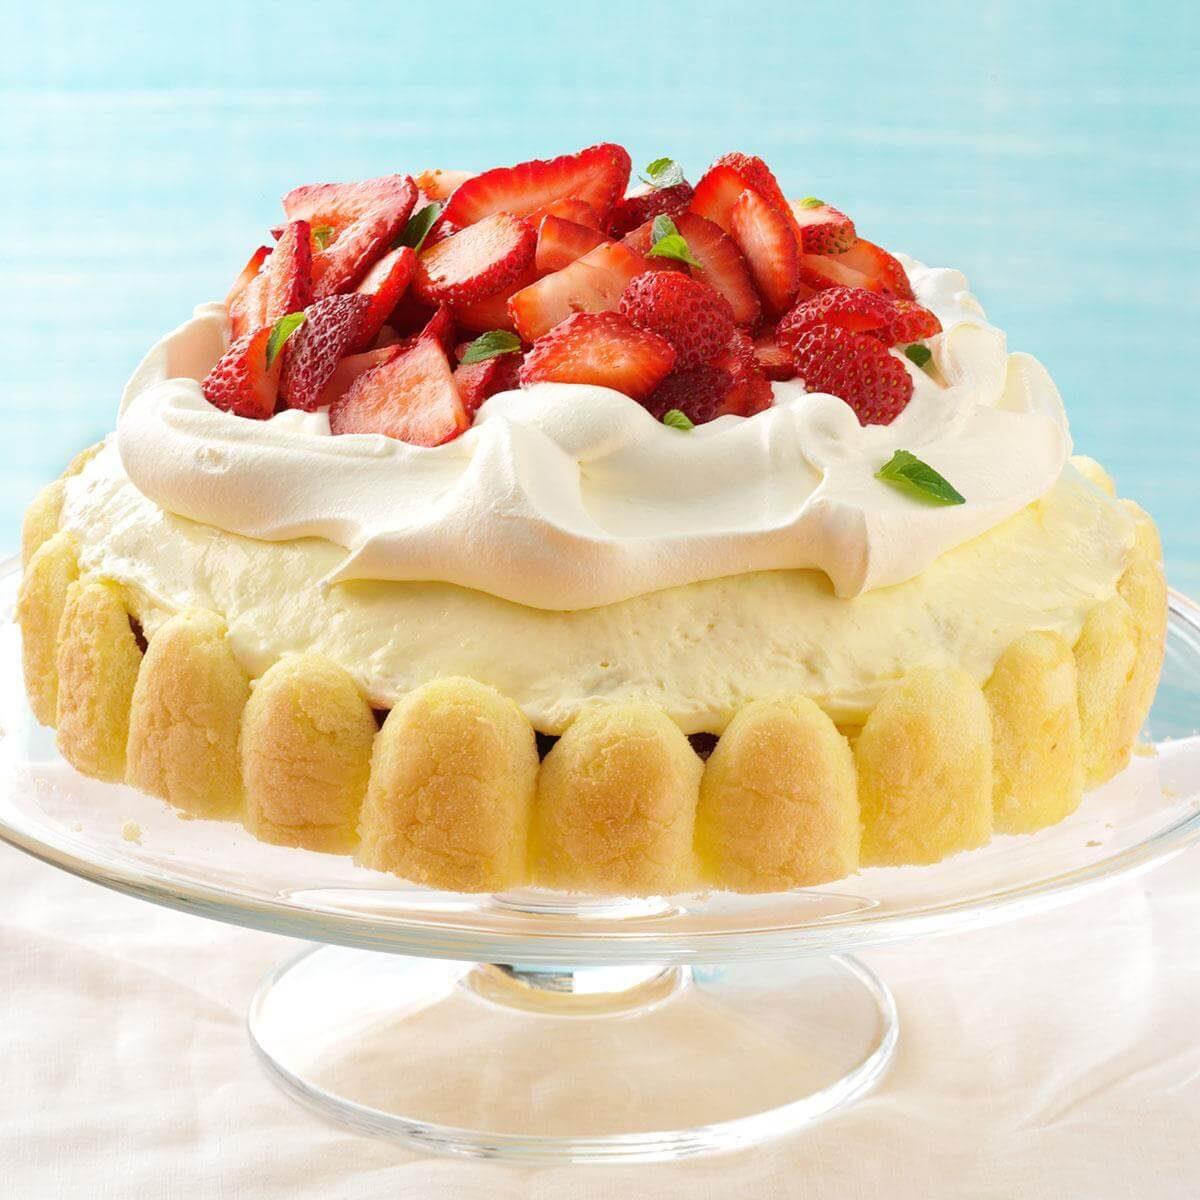 Breezy Lemon-Berry Dessert Recipe